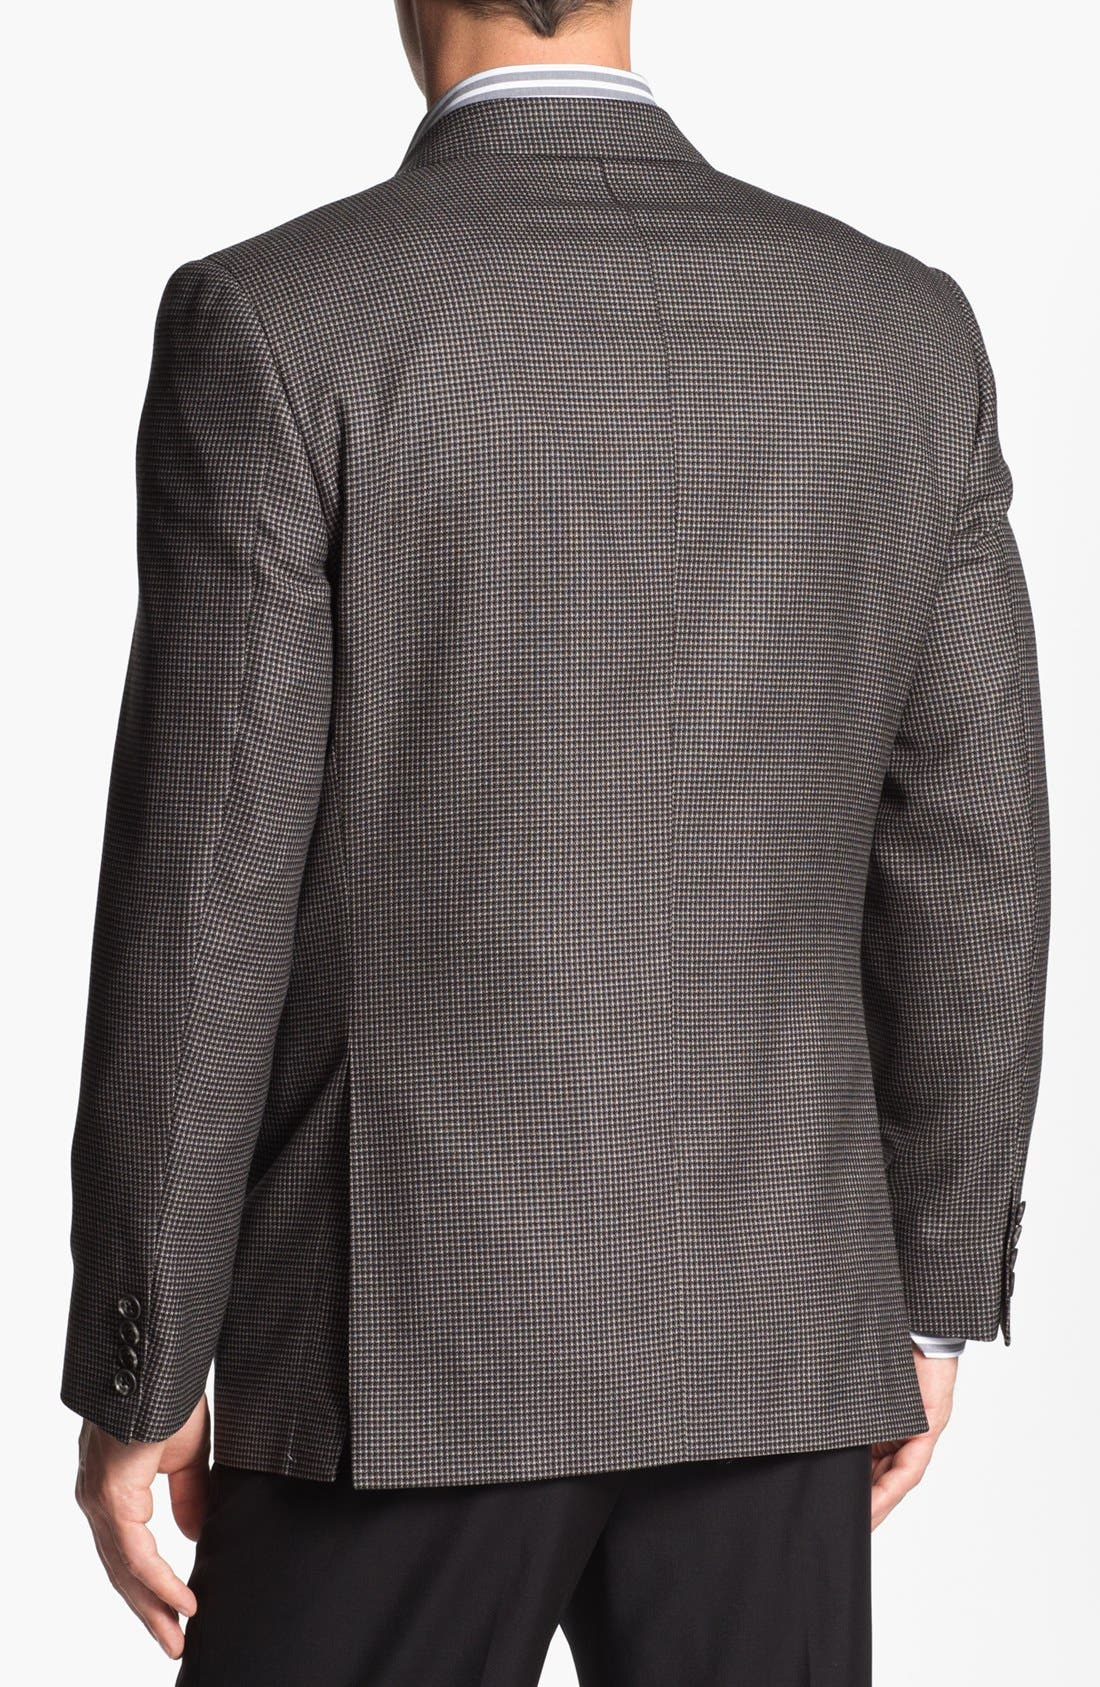 Alternate Image 3  - Joseph Abboud 'Signature Silver' Check Sportcoat